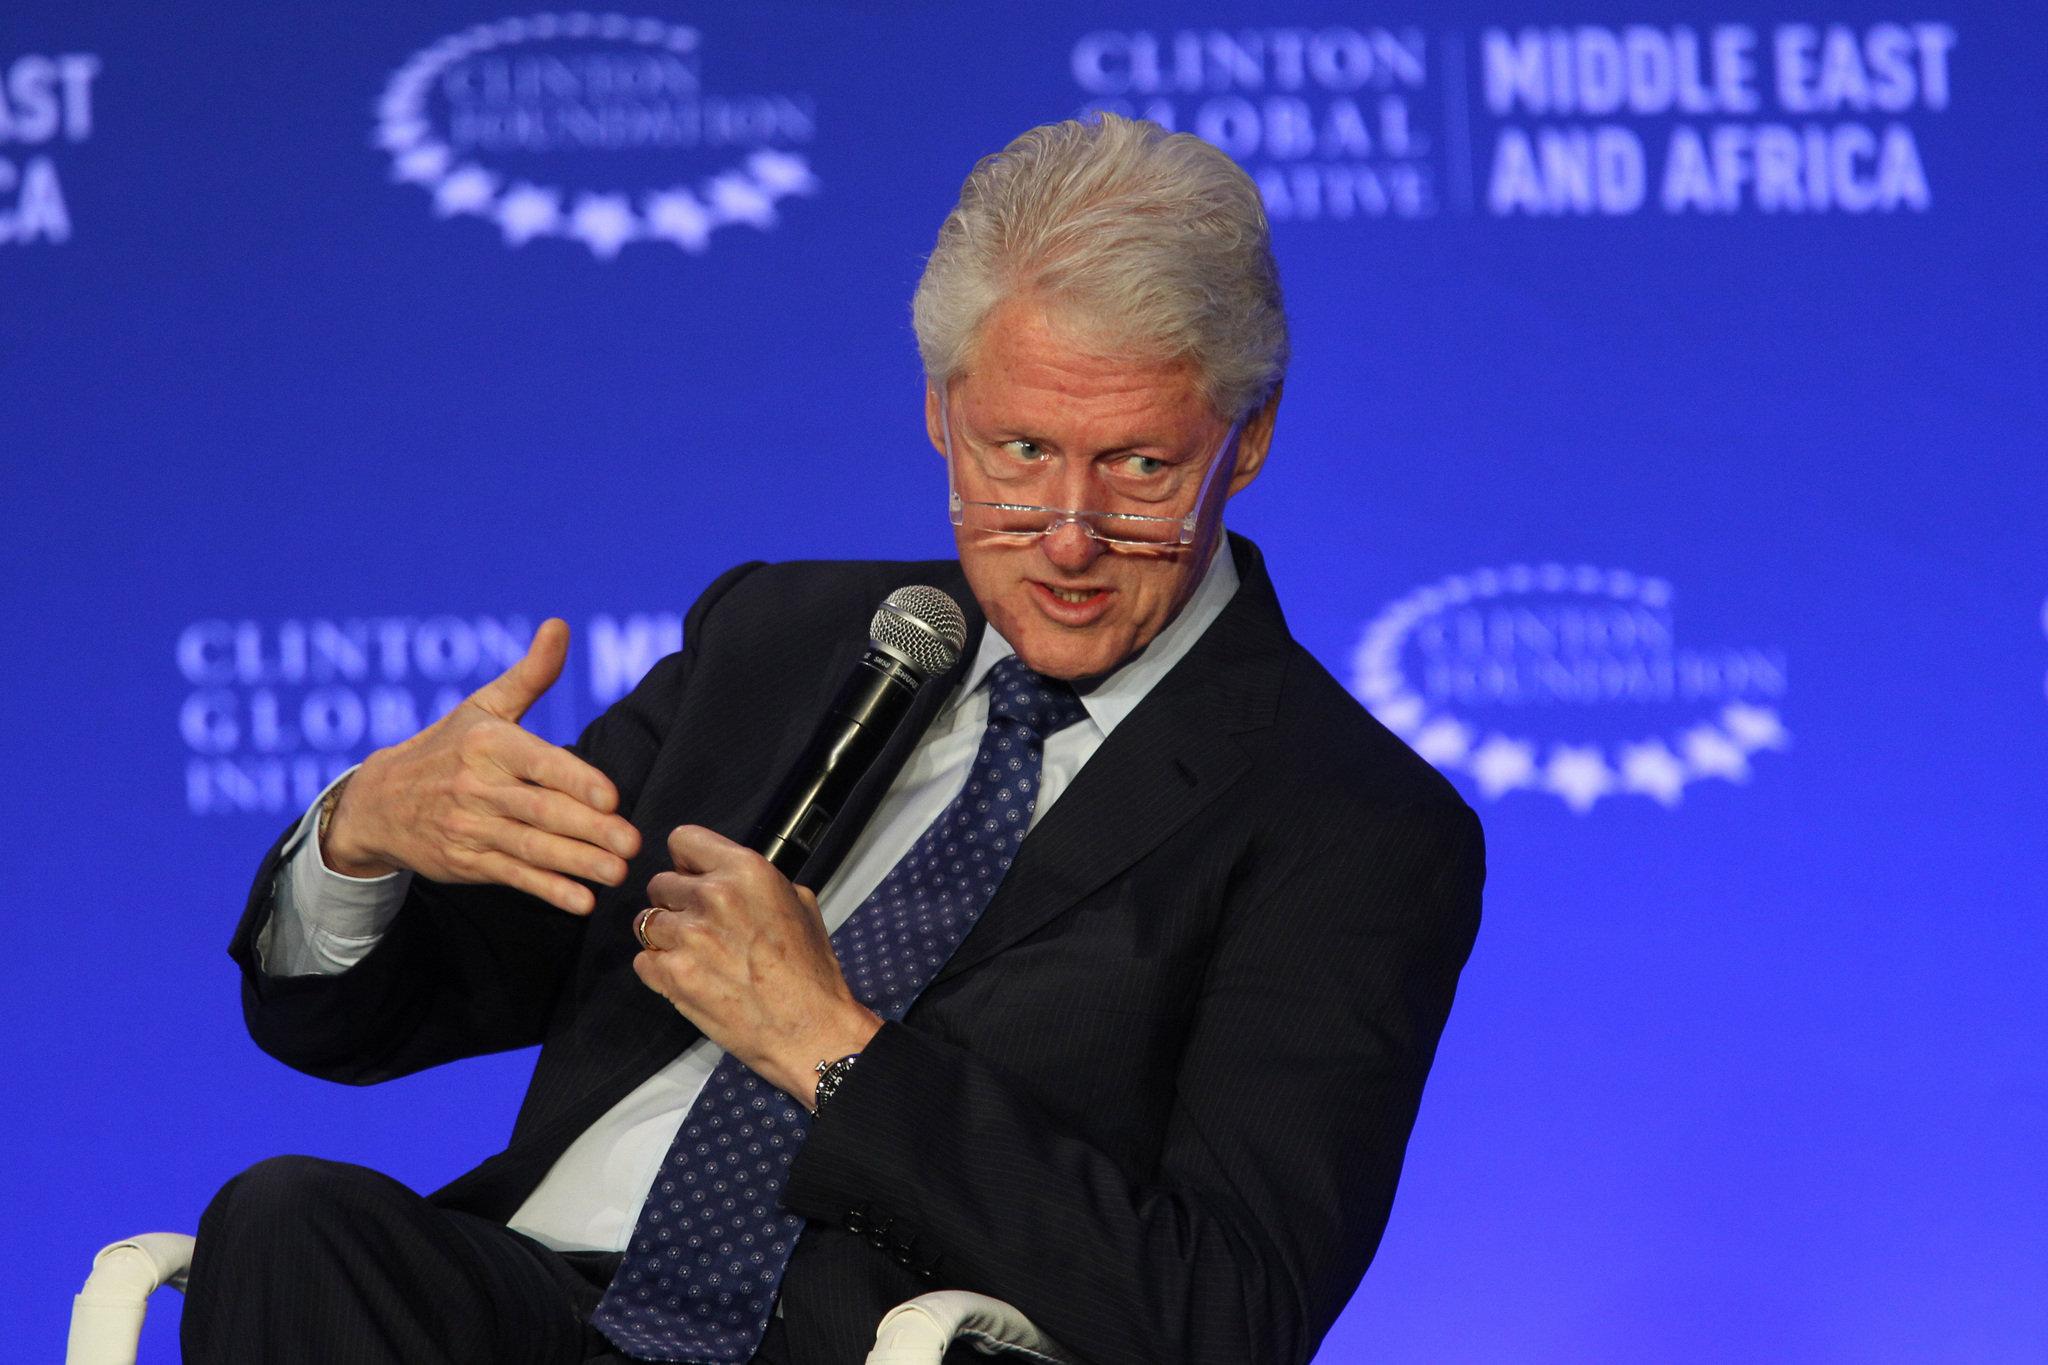 Bill Clinton Background